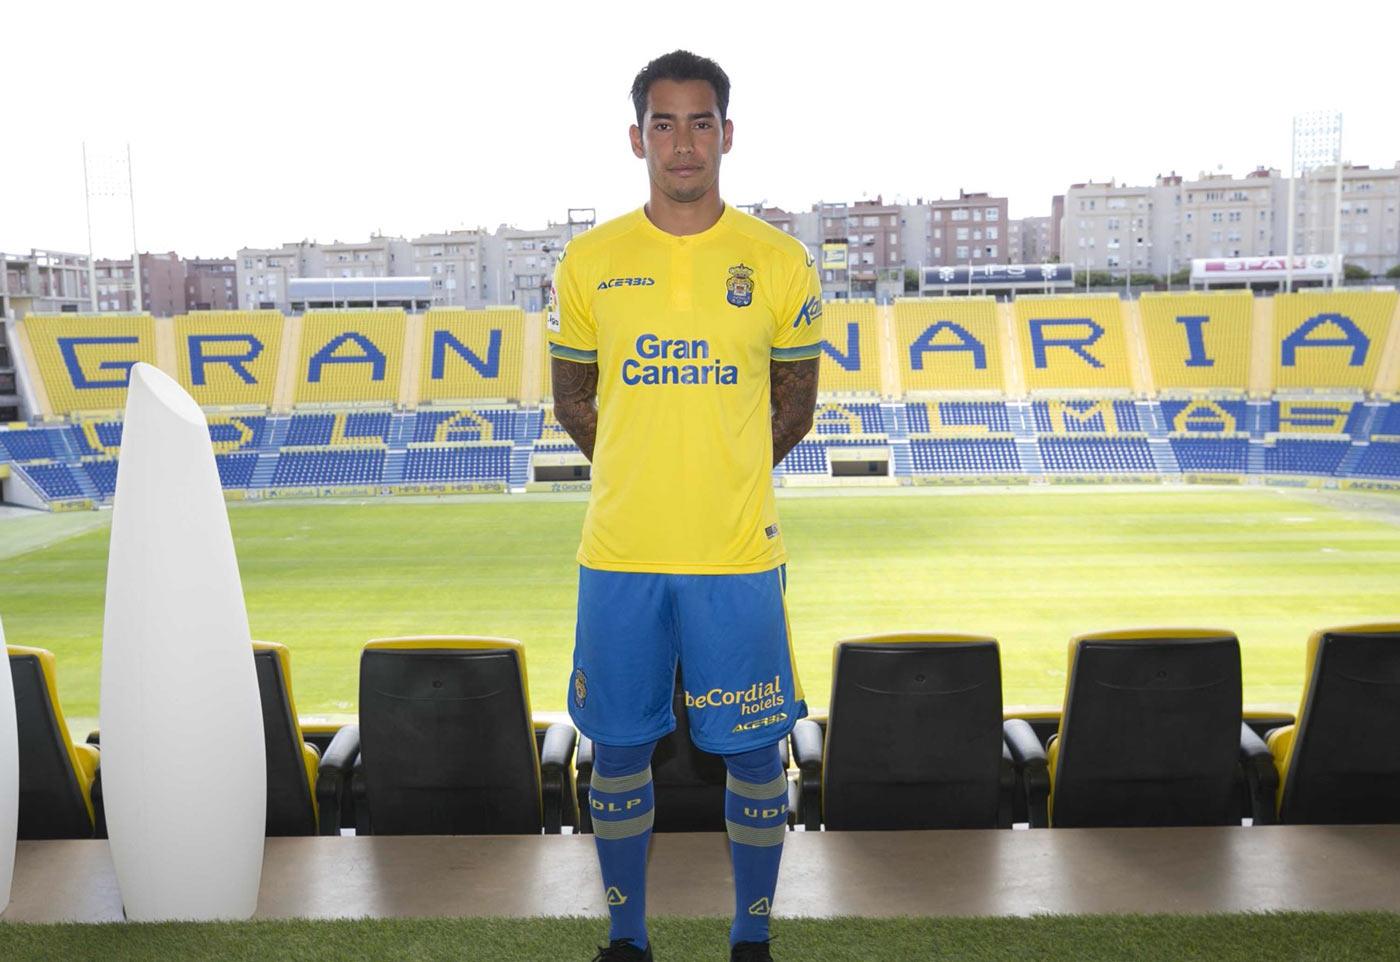 Maglie Las Palmas 2018-2019, la collezione firmata Acerbis